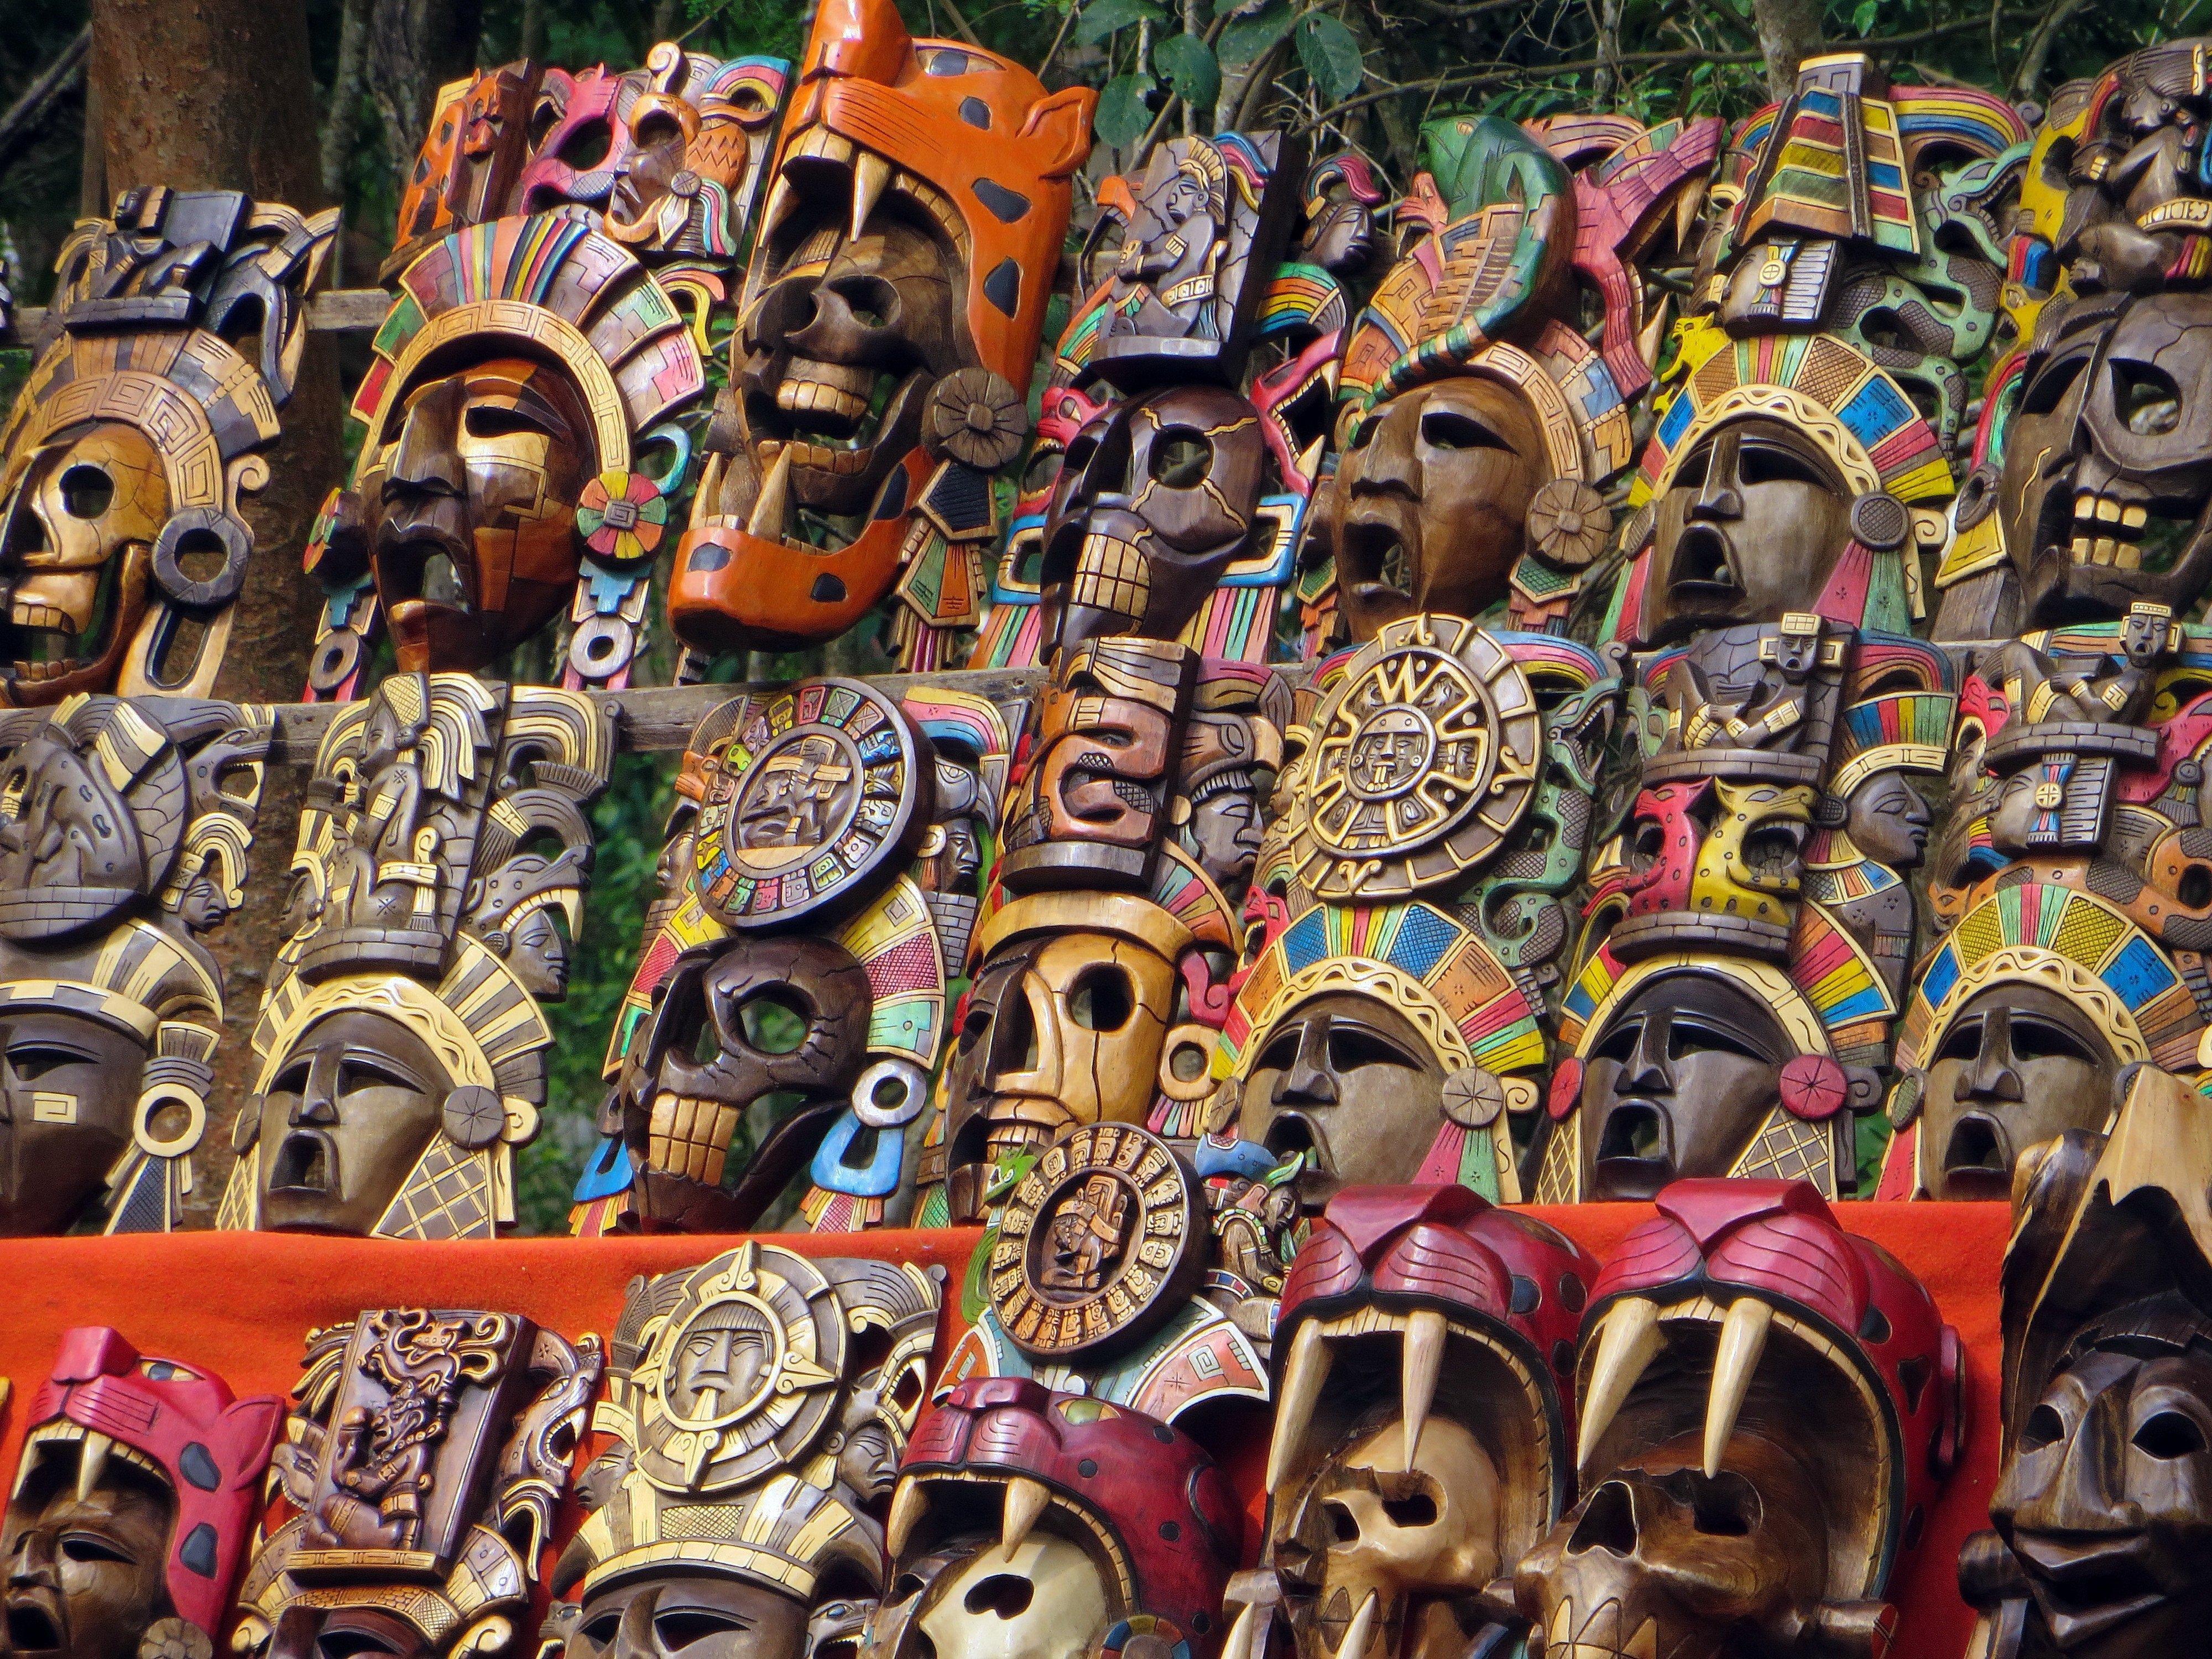 Las máscaras turísticas, México